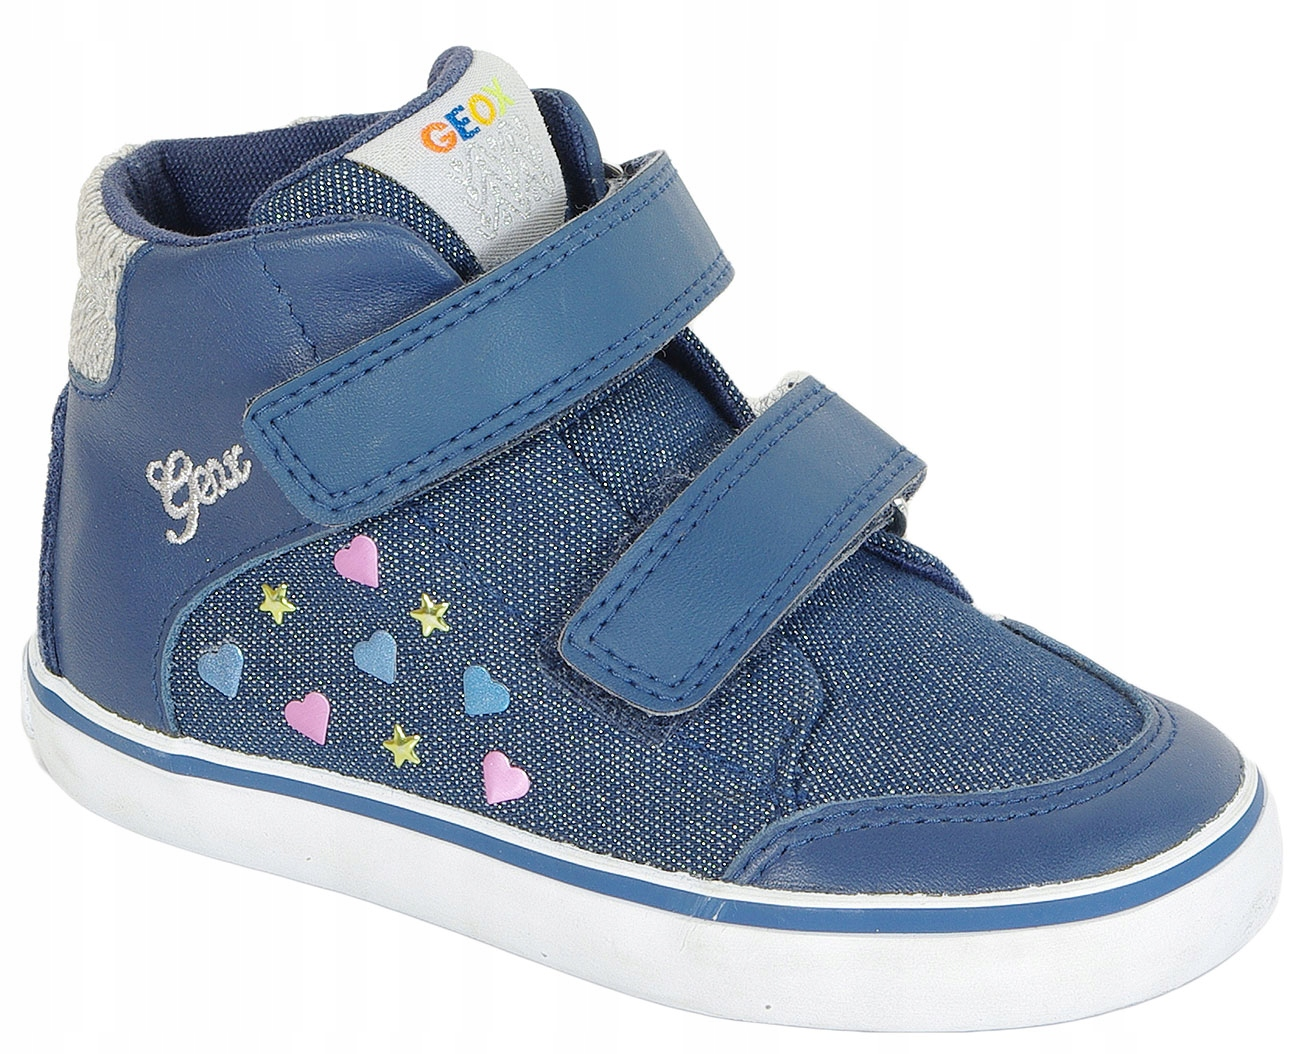 GEOX Kiwi A sneakers Shi Denim+Nappa Navy 21